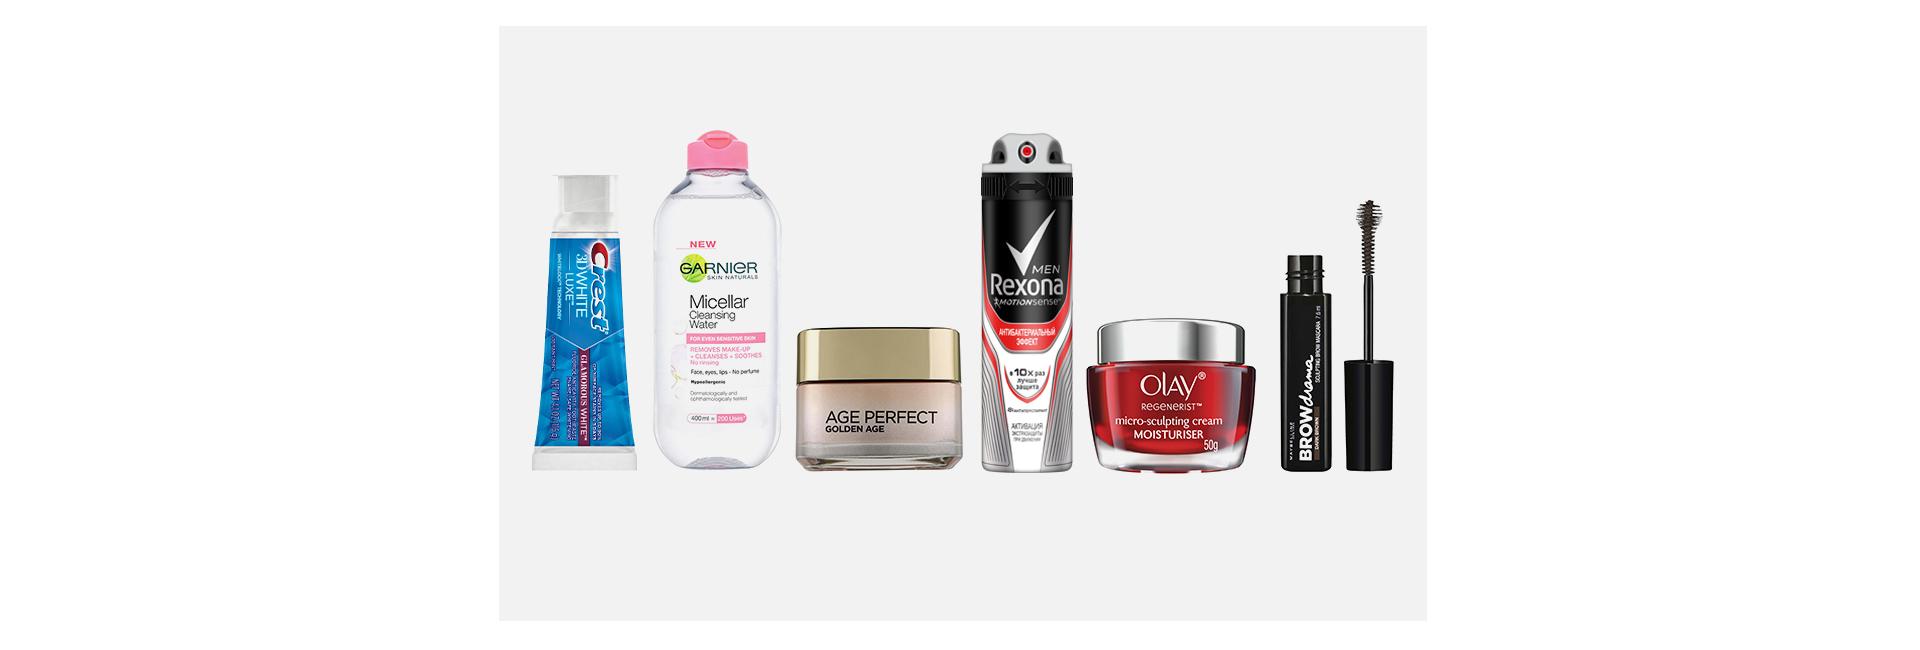 L'oral paris Perfect Match Make-up 1R1C bipa Online Shop Loral PARiS Perfect Match: So findest du deine Nuance LOral Perfect Match Make Up Test